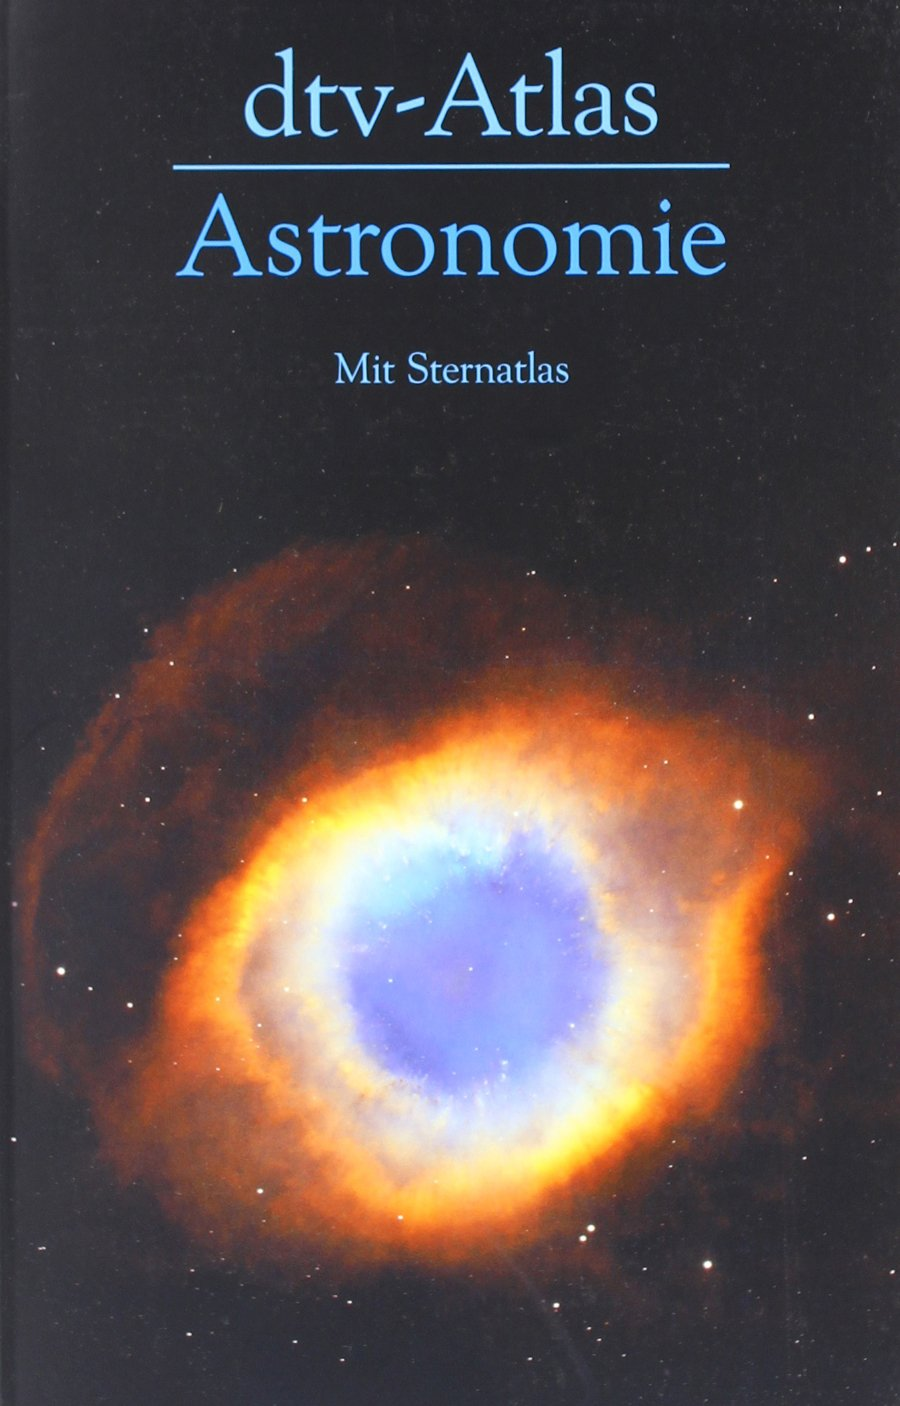 dtv-Atlas Astronomie: Mit Sternatlas